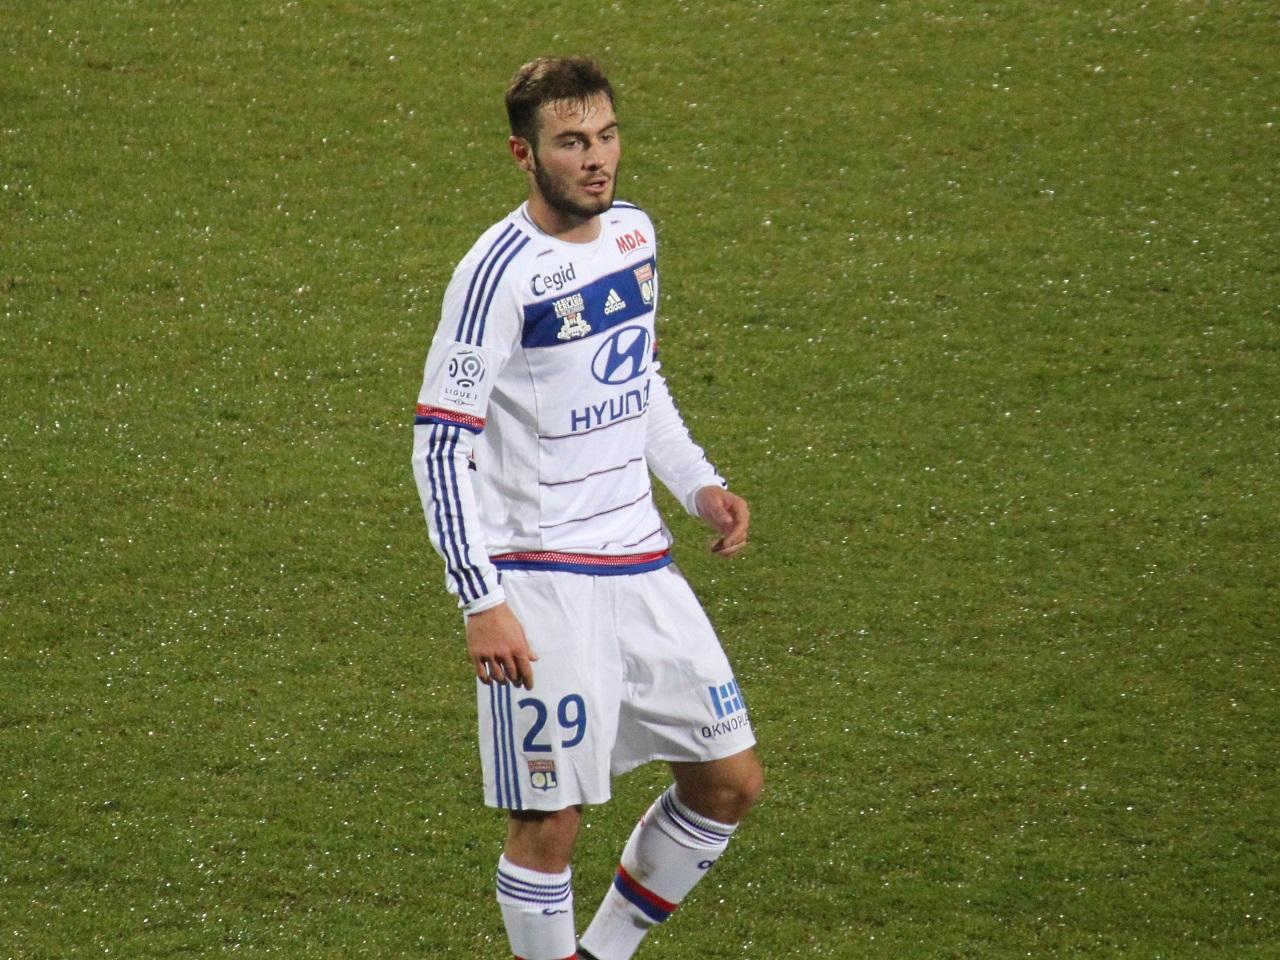 Maillot Extérieur Olympique Lyonnais Lucas TOUSART